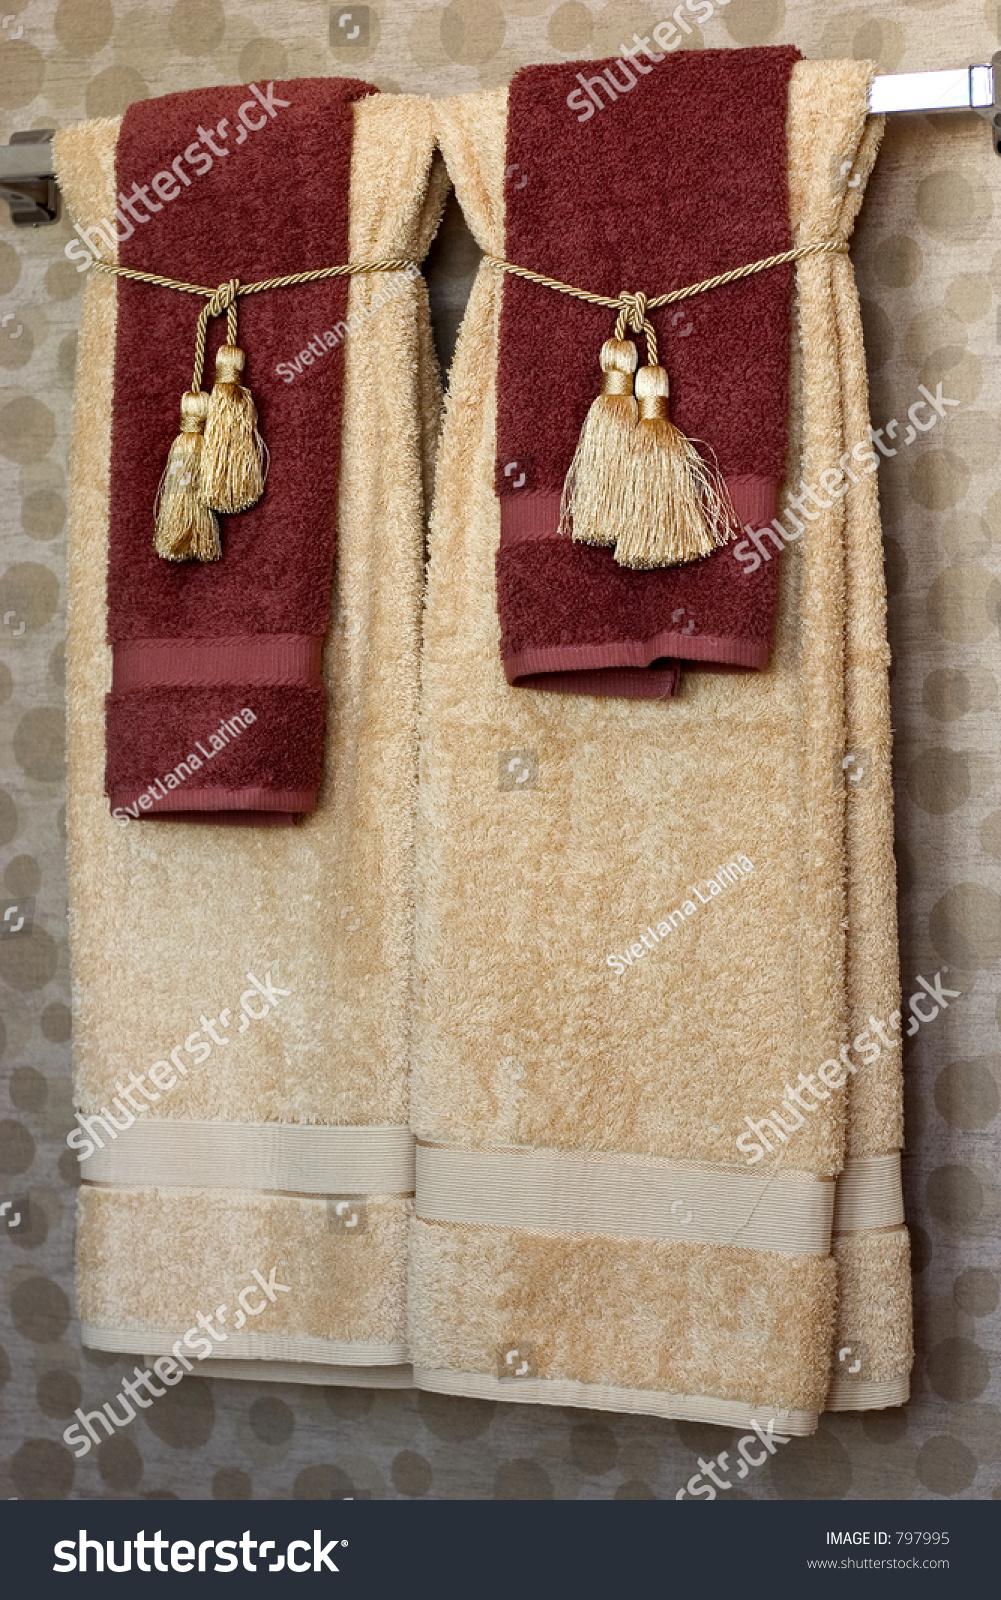 Luxurious Bath Towels Golden Tassels Stock Photo 797995